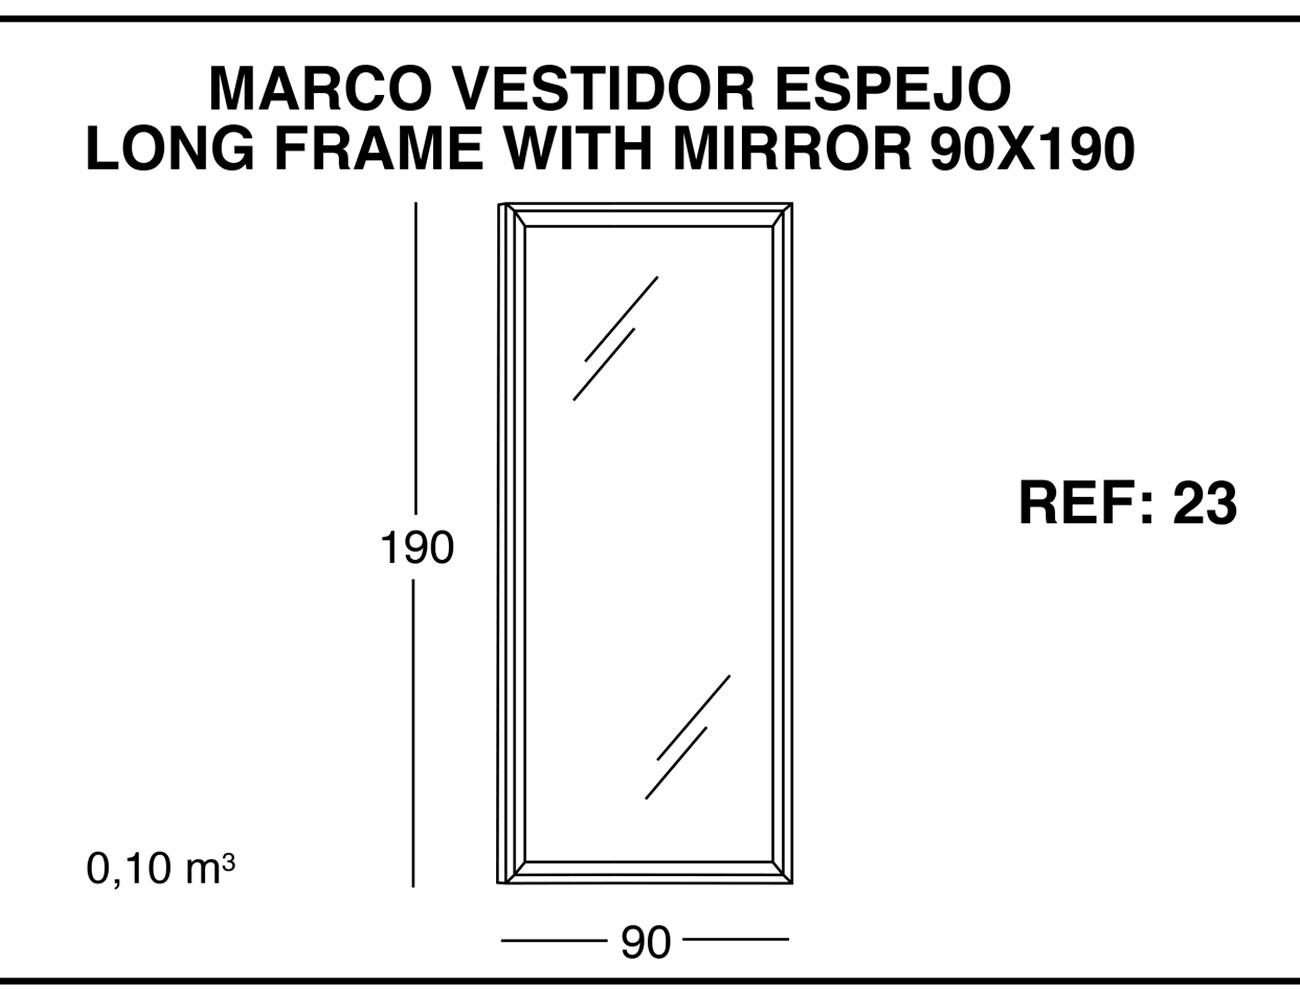 Marco vestidor espejo 90x190